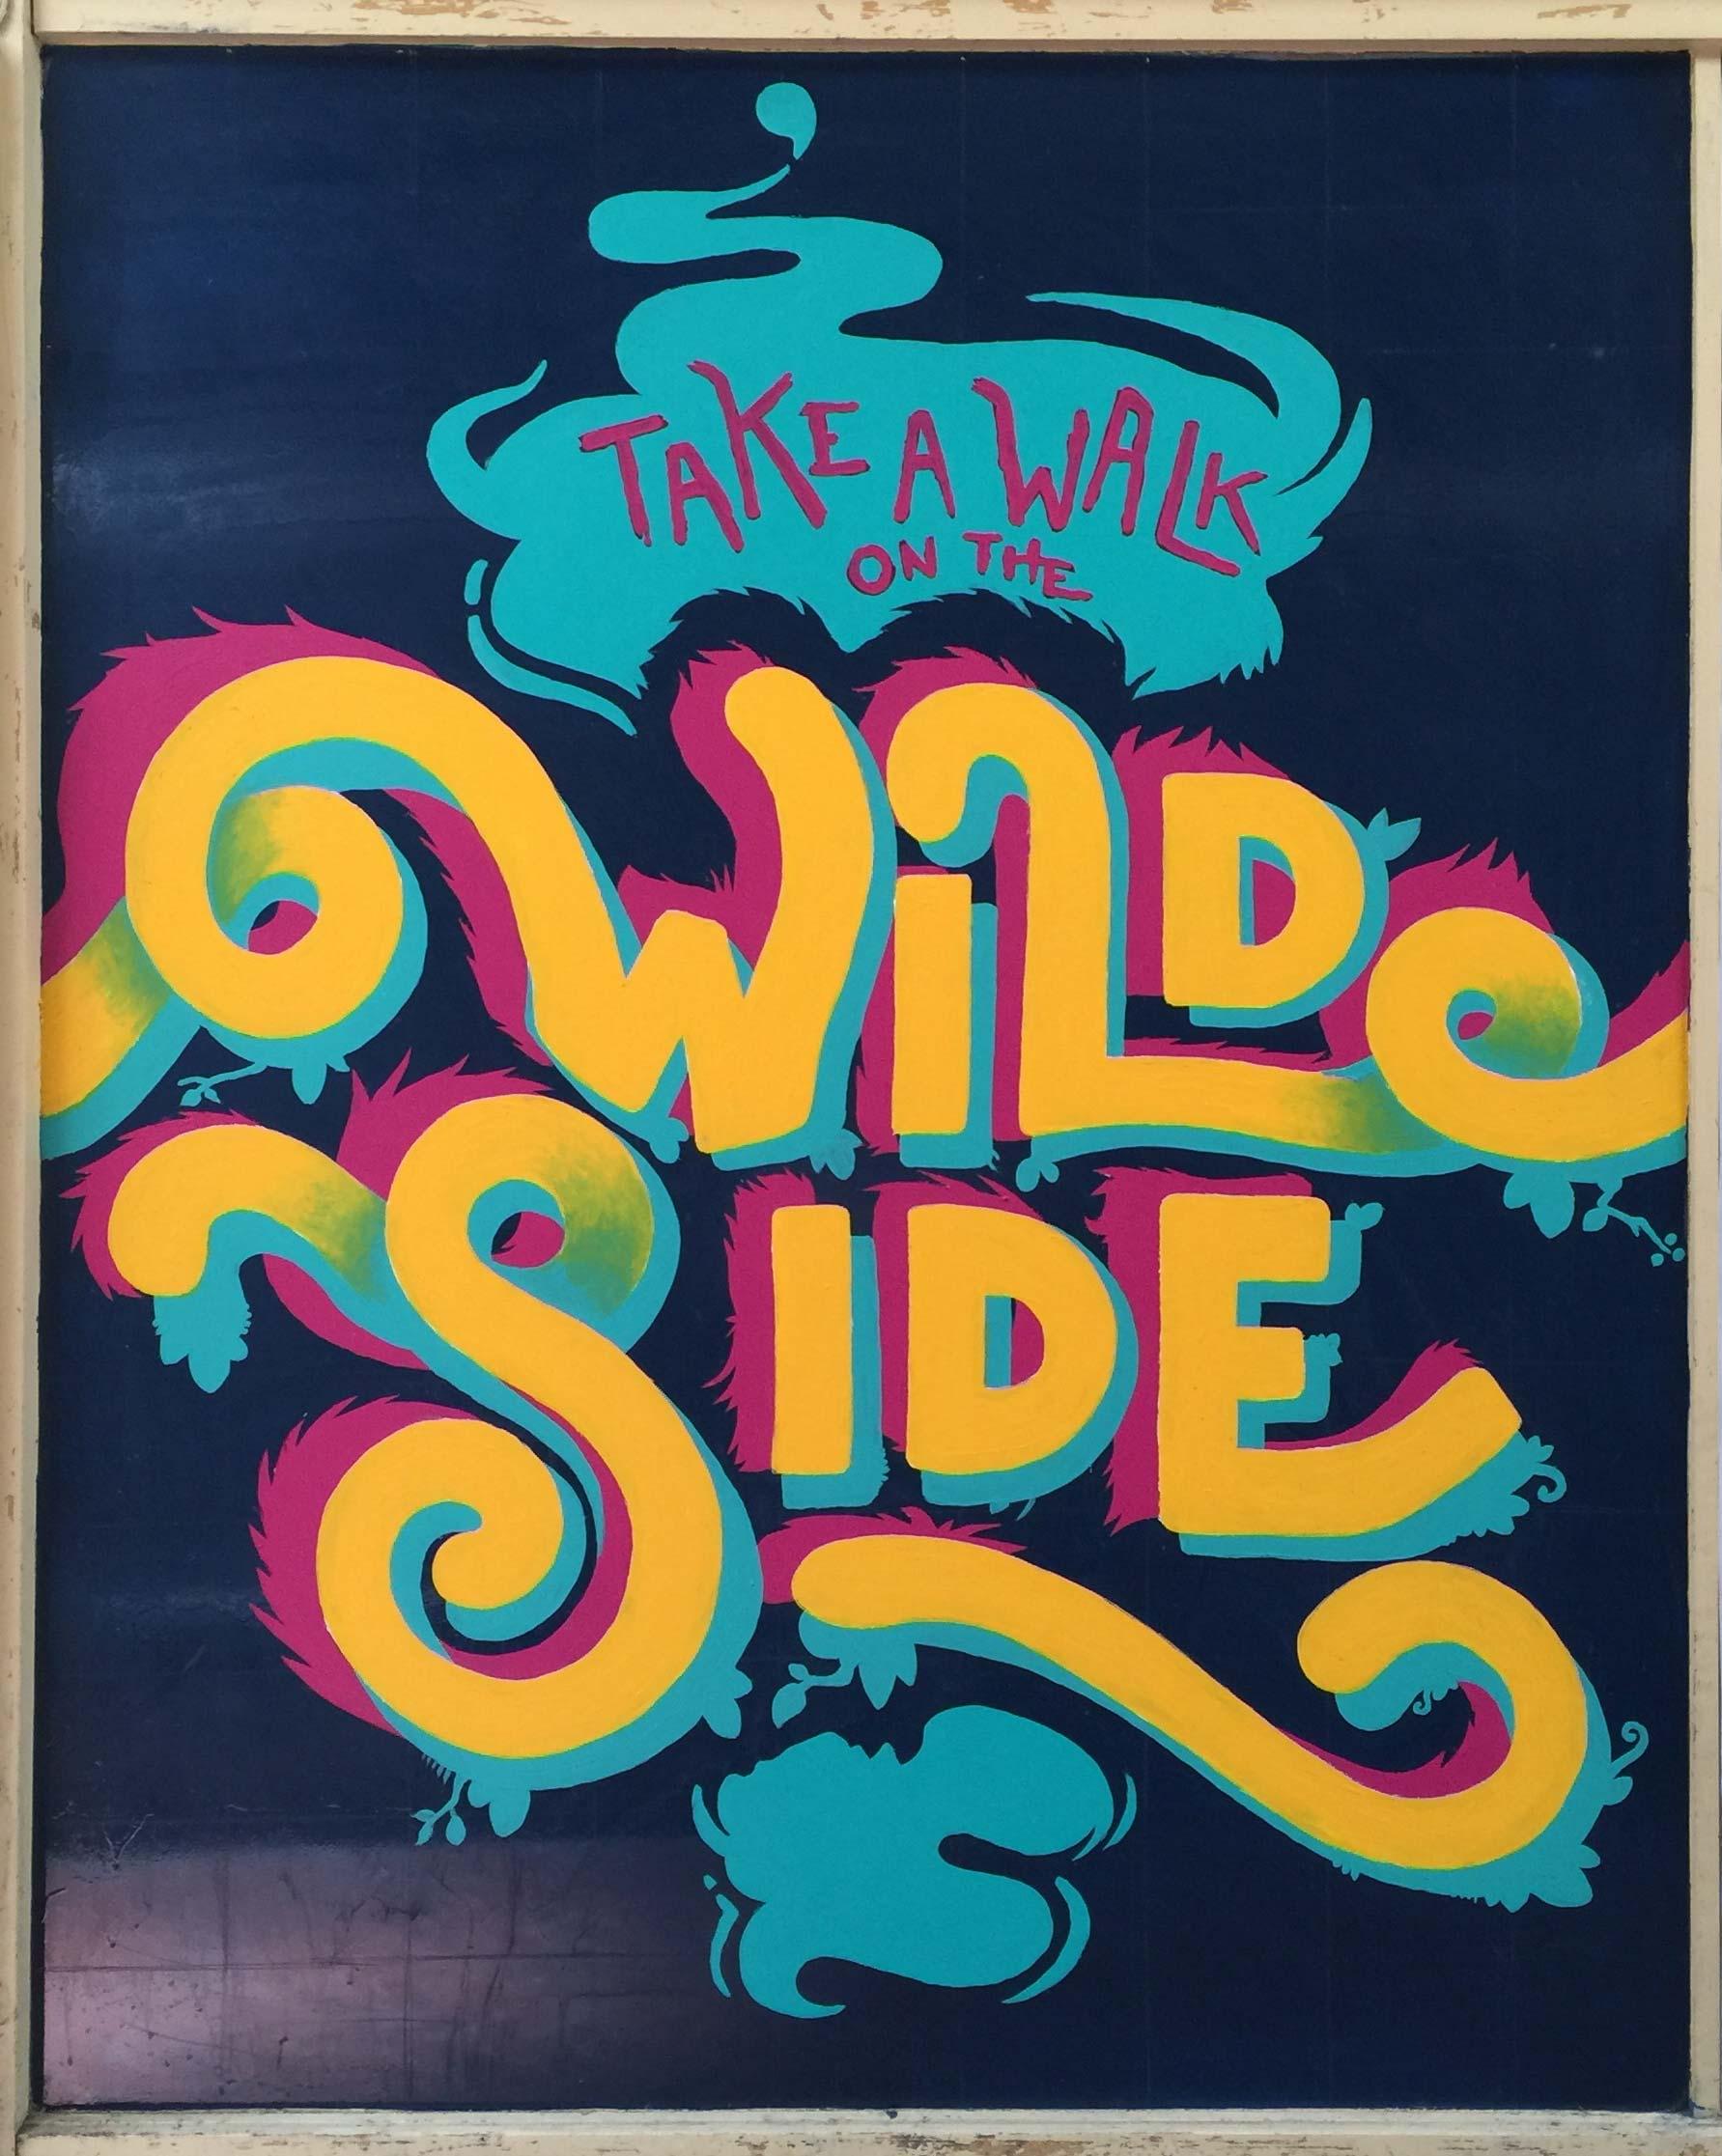 alex-allans-walk-bendigo-mural-take-a-walk-on-the-wild-side